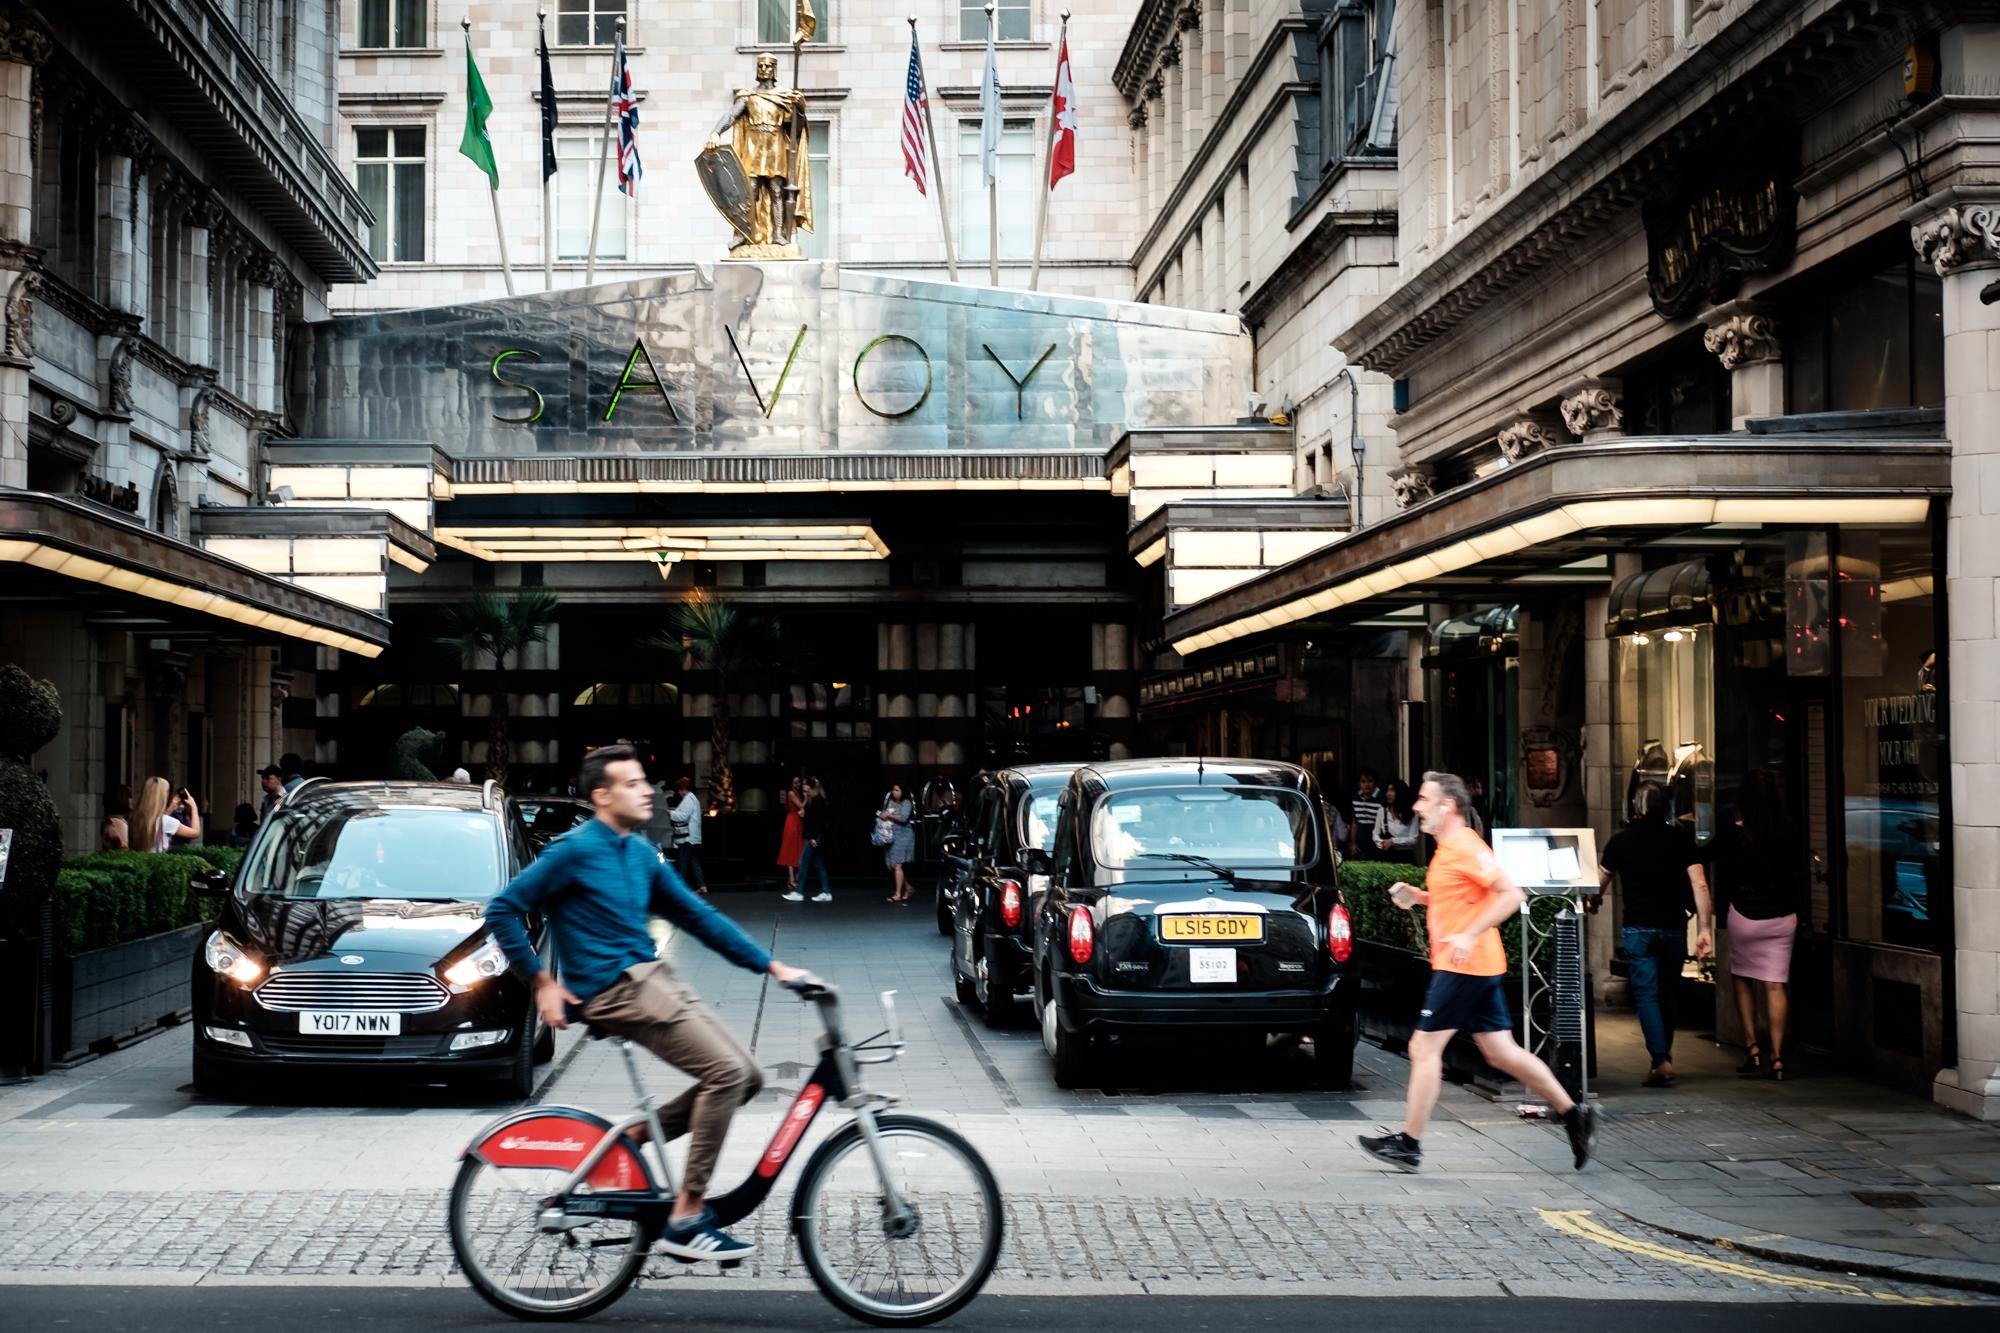 London Chrome -180621 - The Strand - 001.jpg